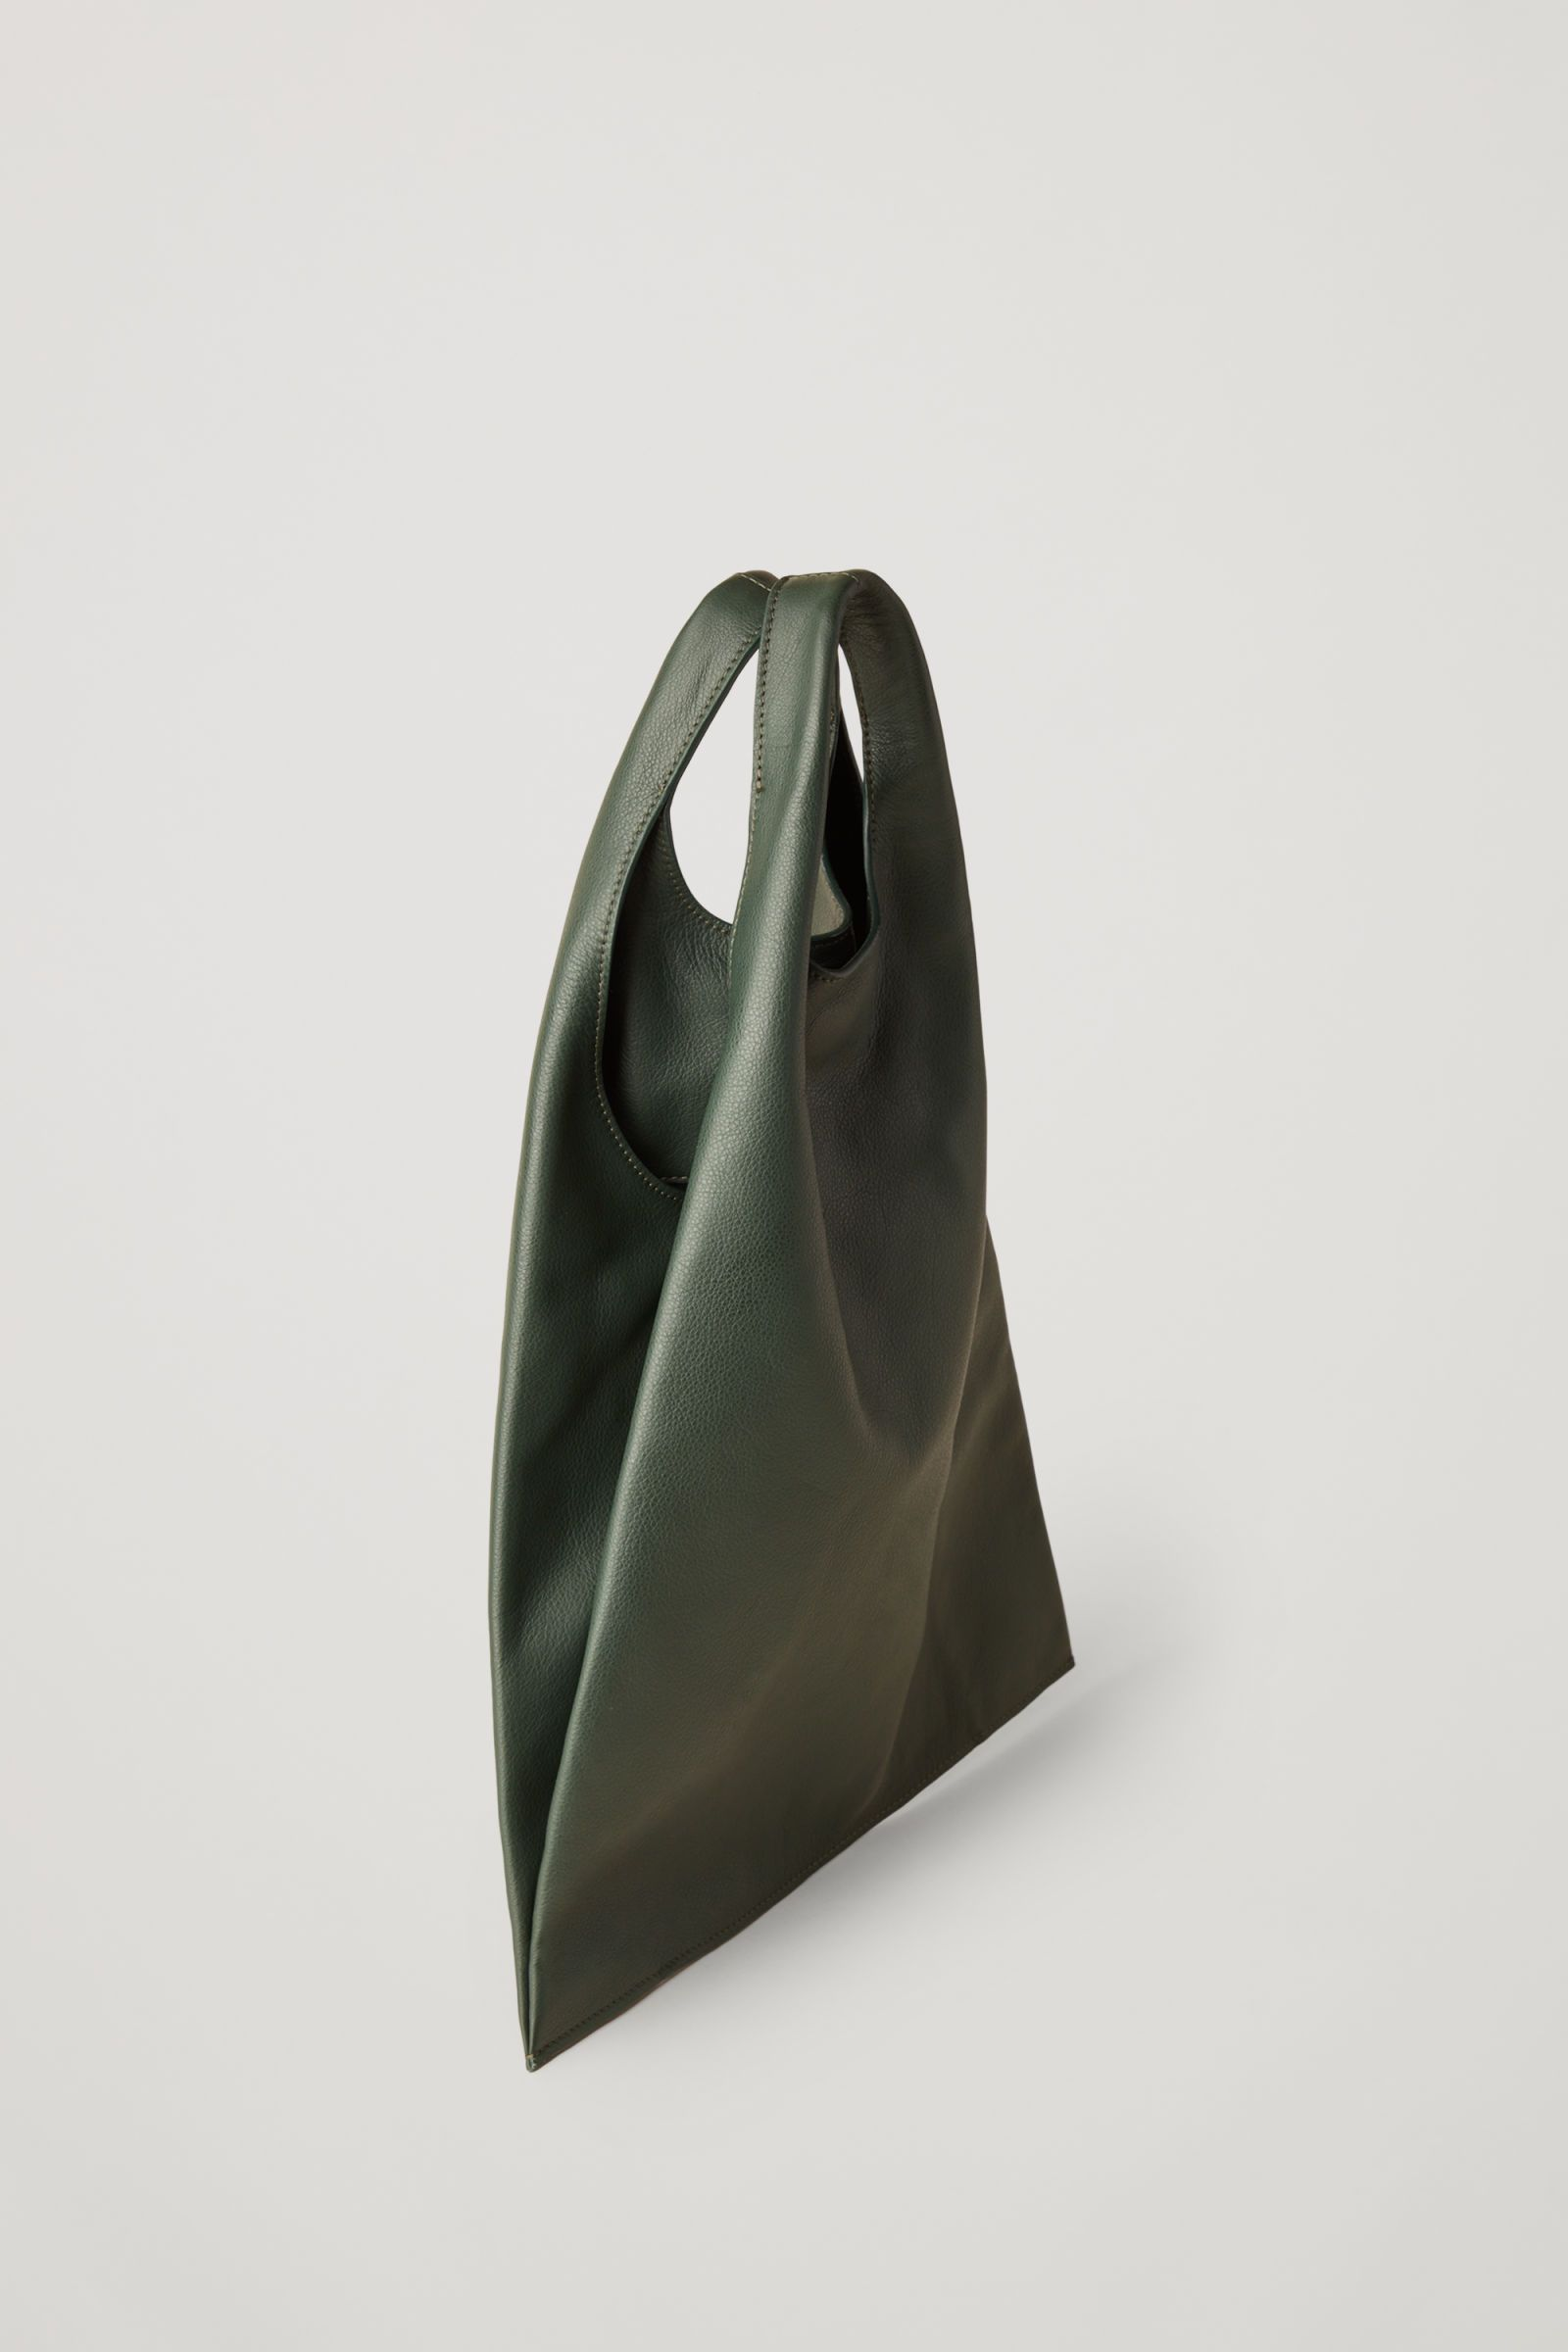 Leather Deconstructed Shopper Bag Leder Ledertasche Taschen